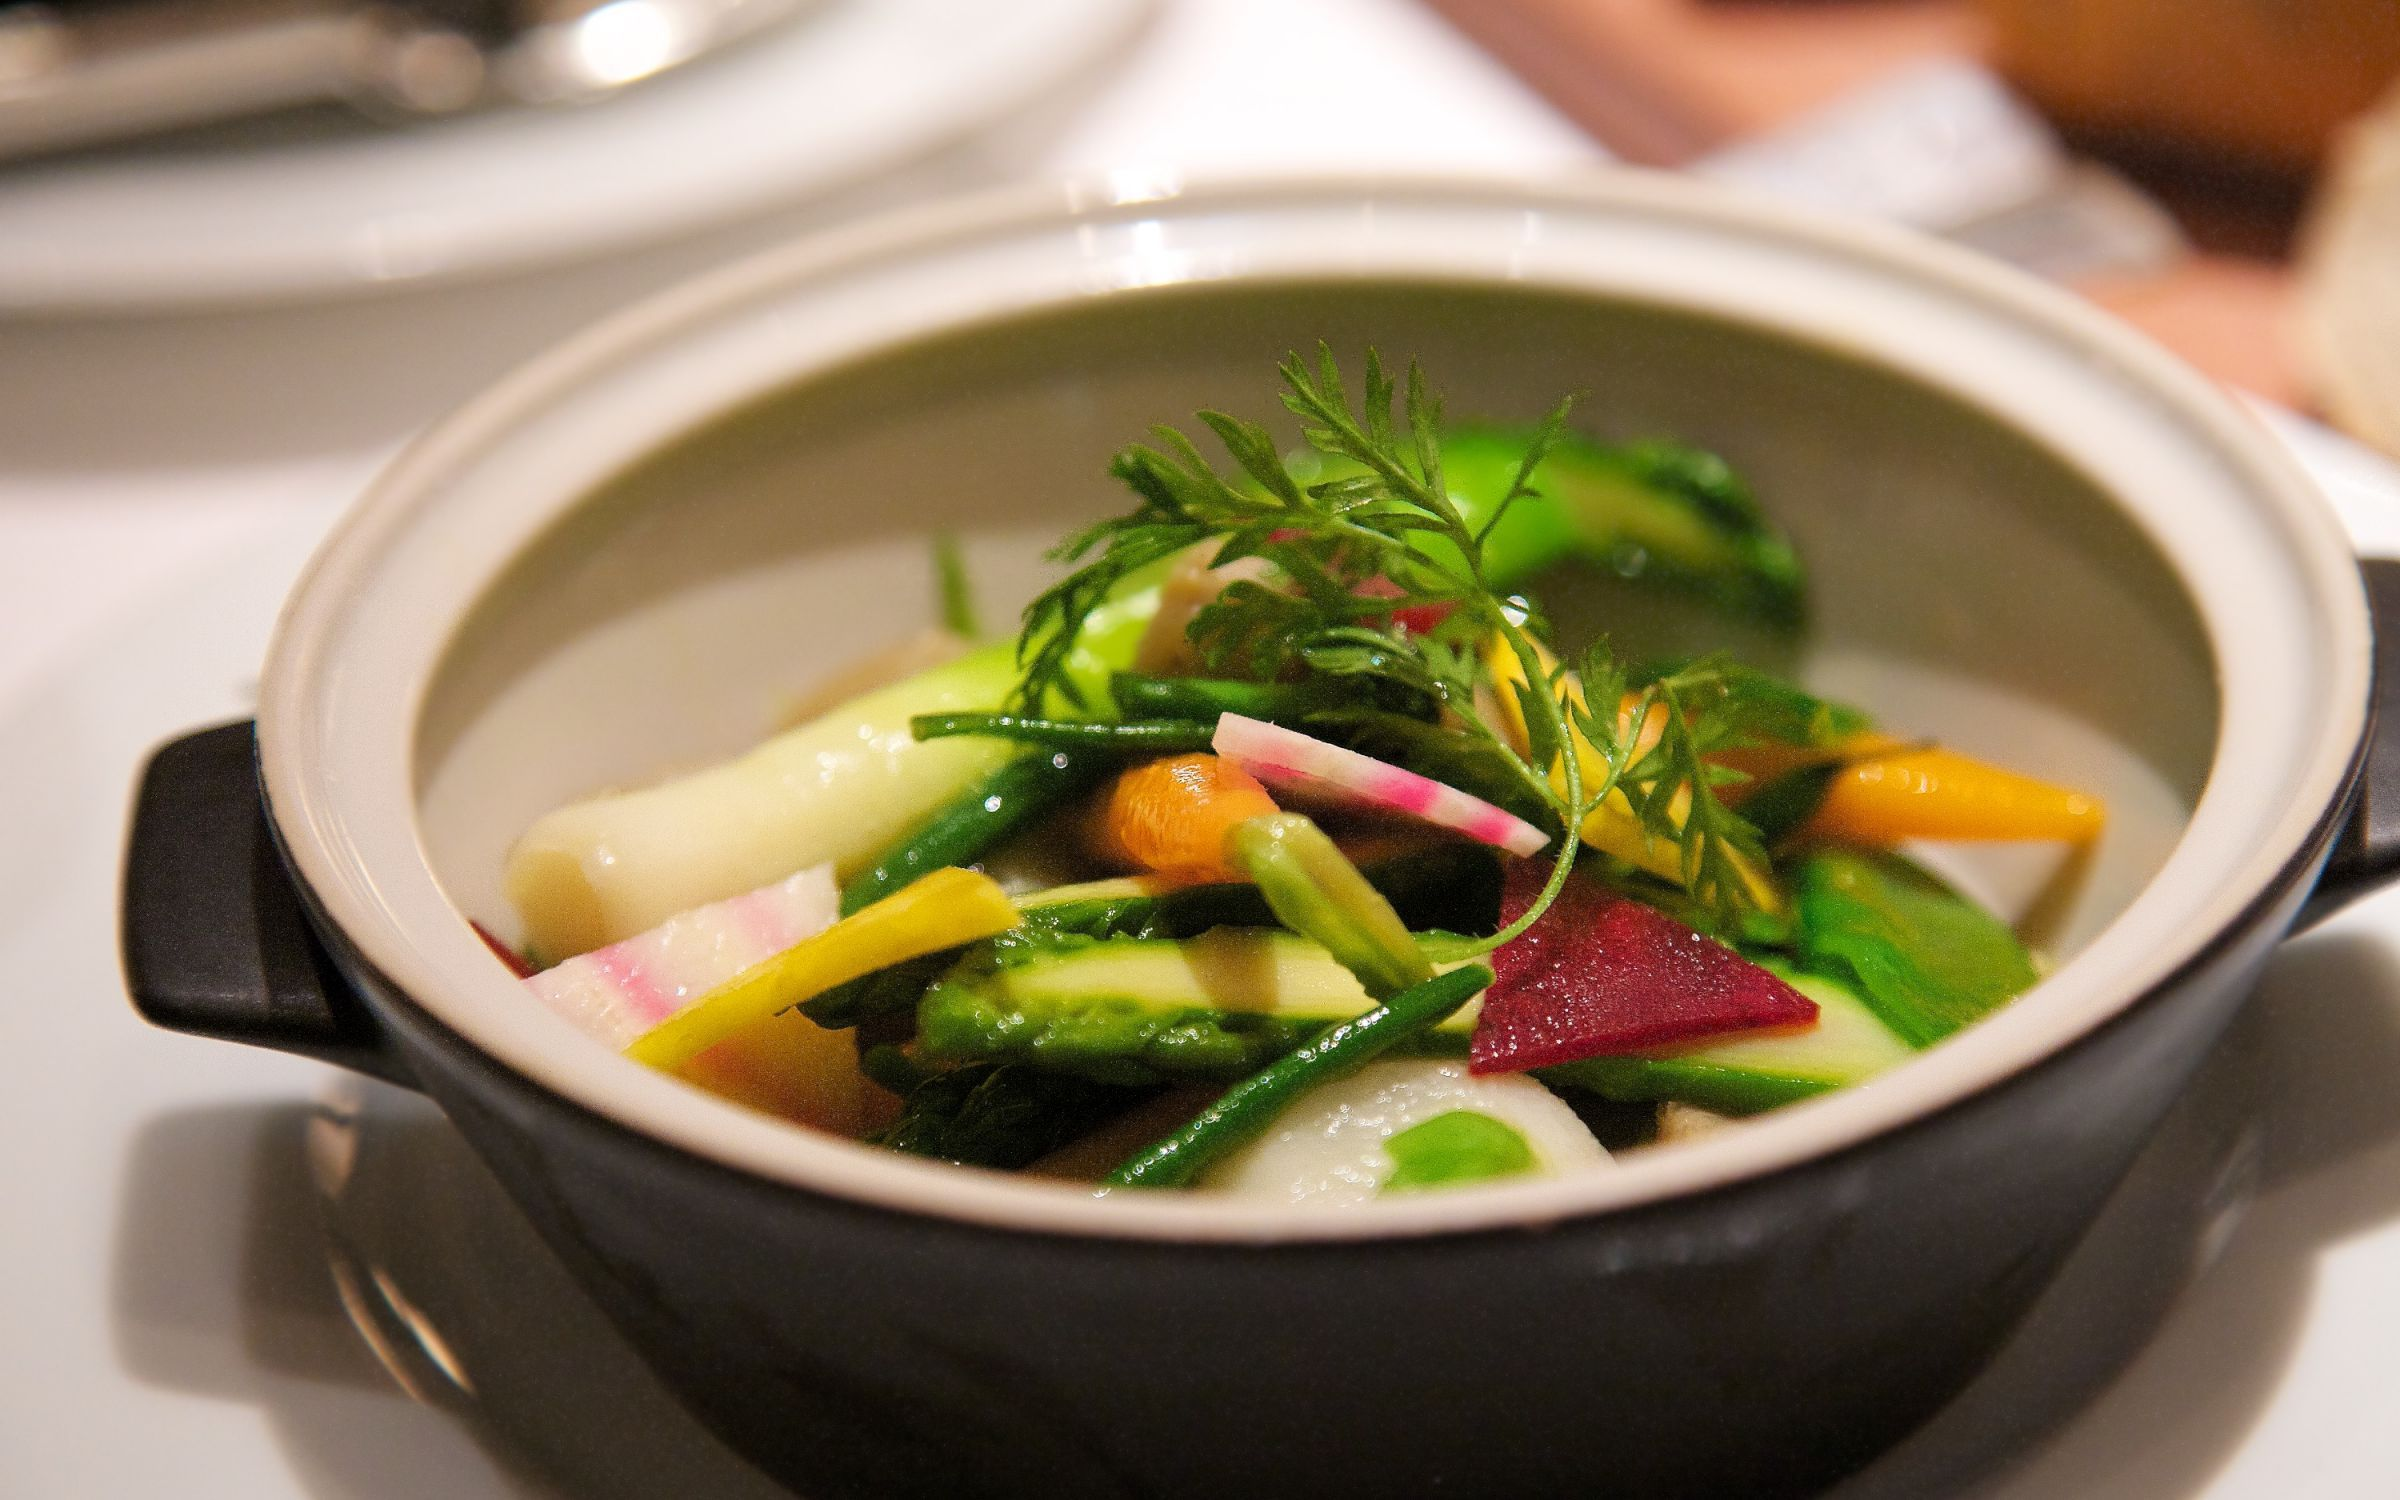 La cuisine royal monceau qli travel qli travel restaurants wines and travel - La cuisine hotel royal monceau ...